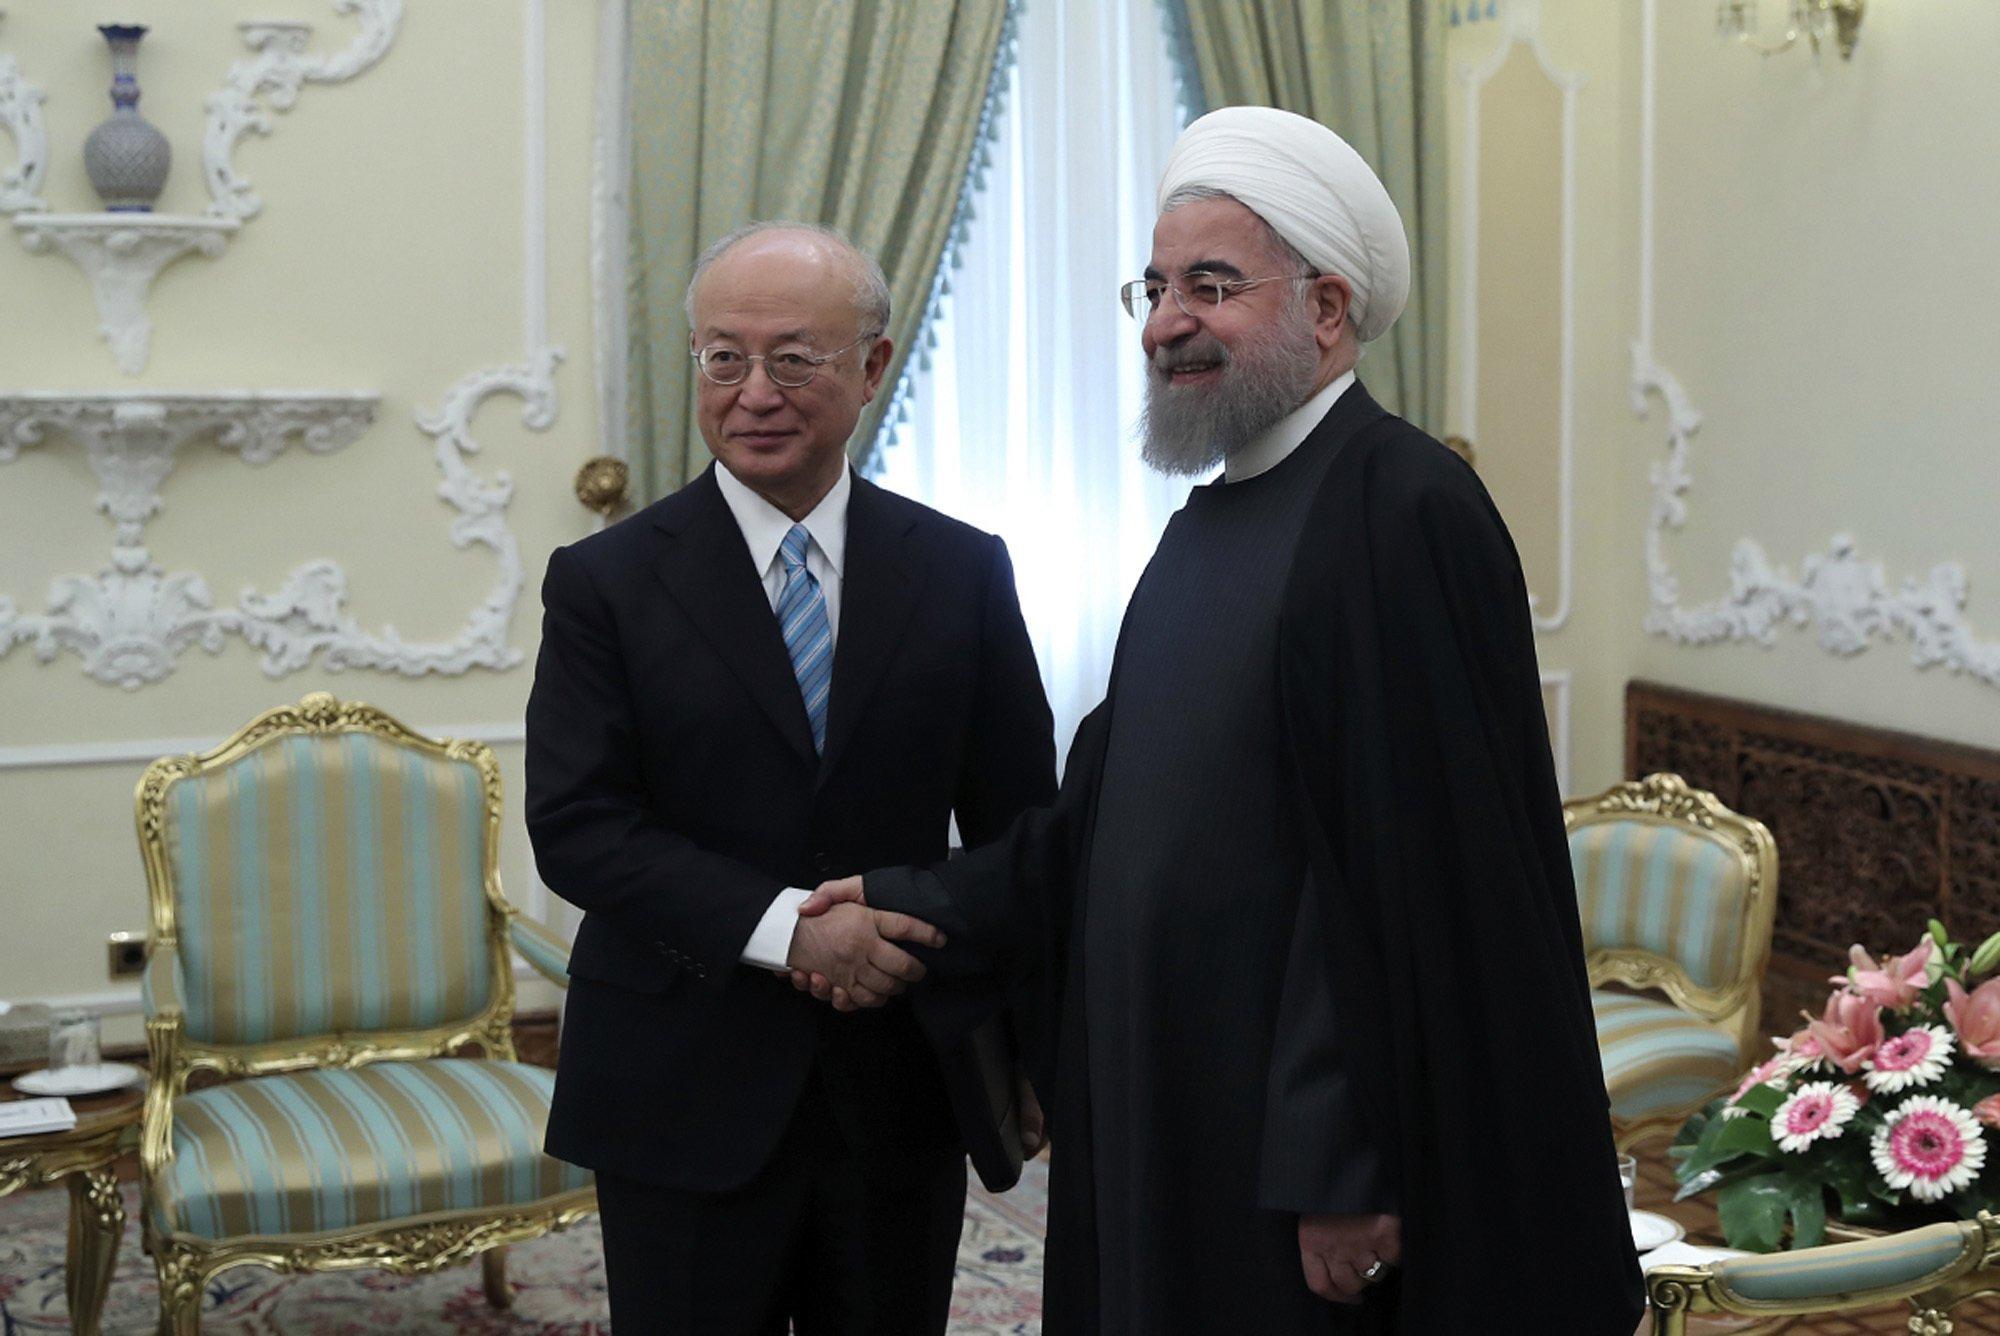 Head of UN nuclear watchdog visits Iran